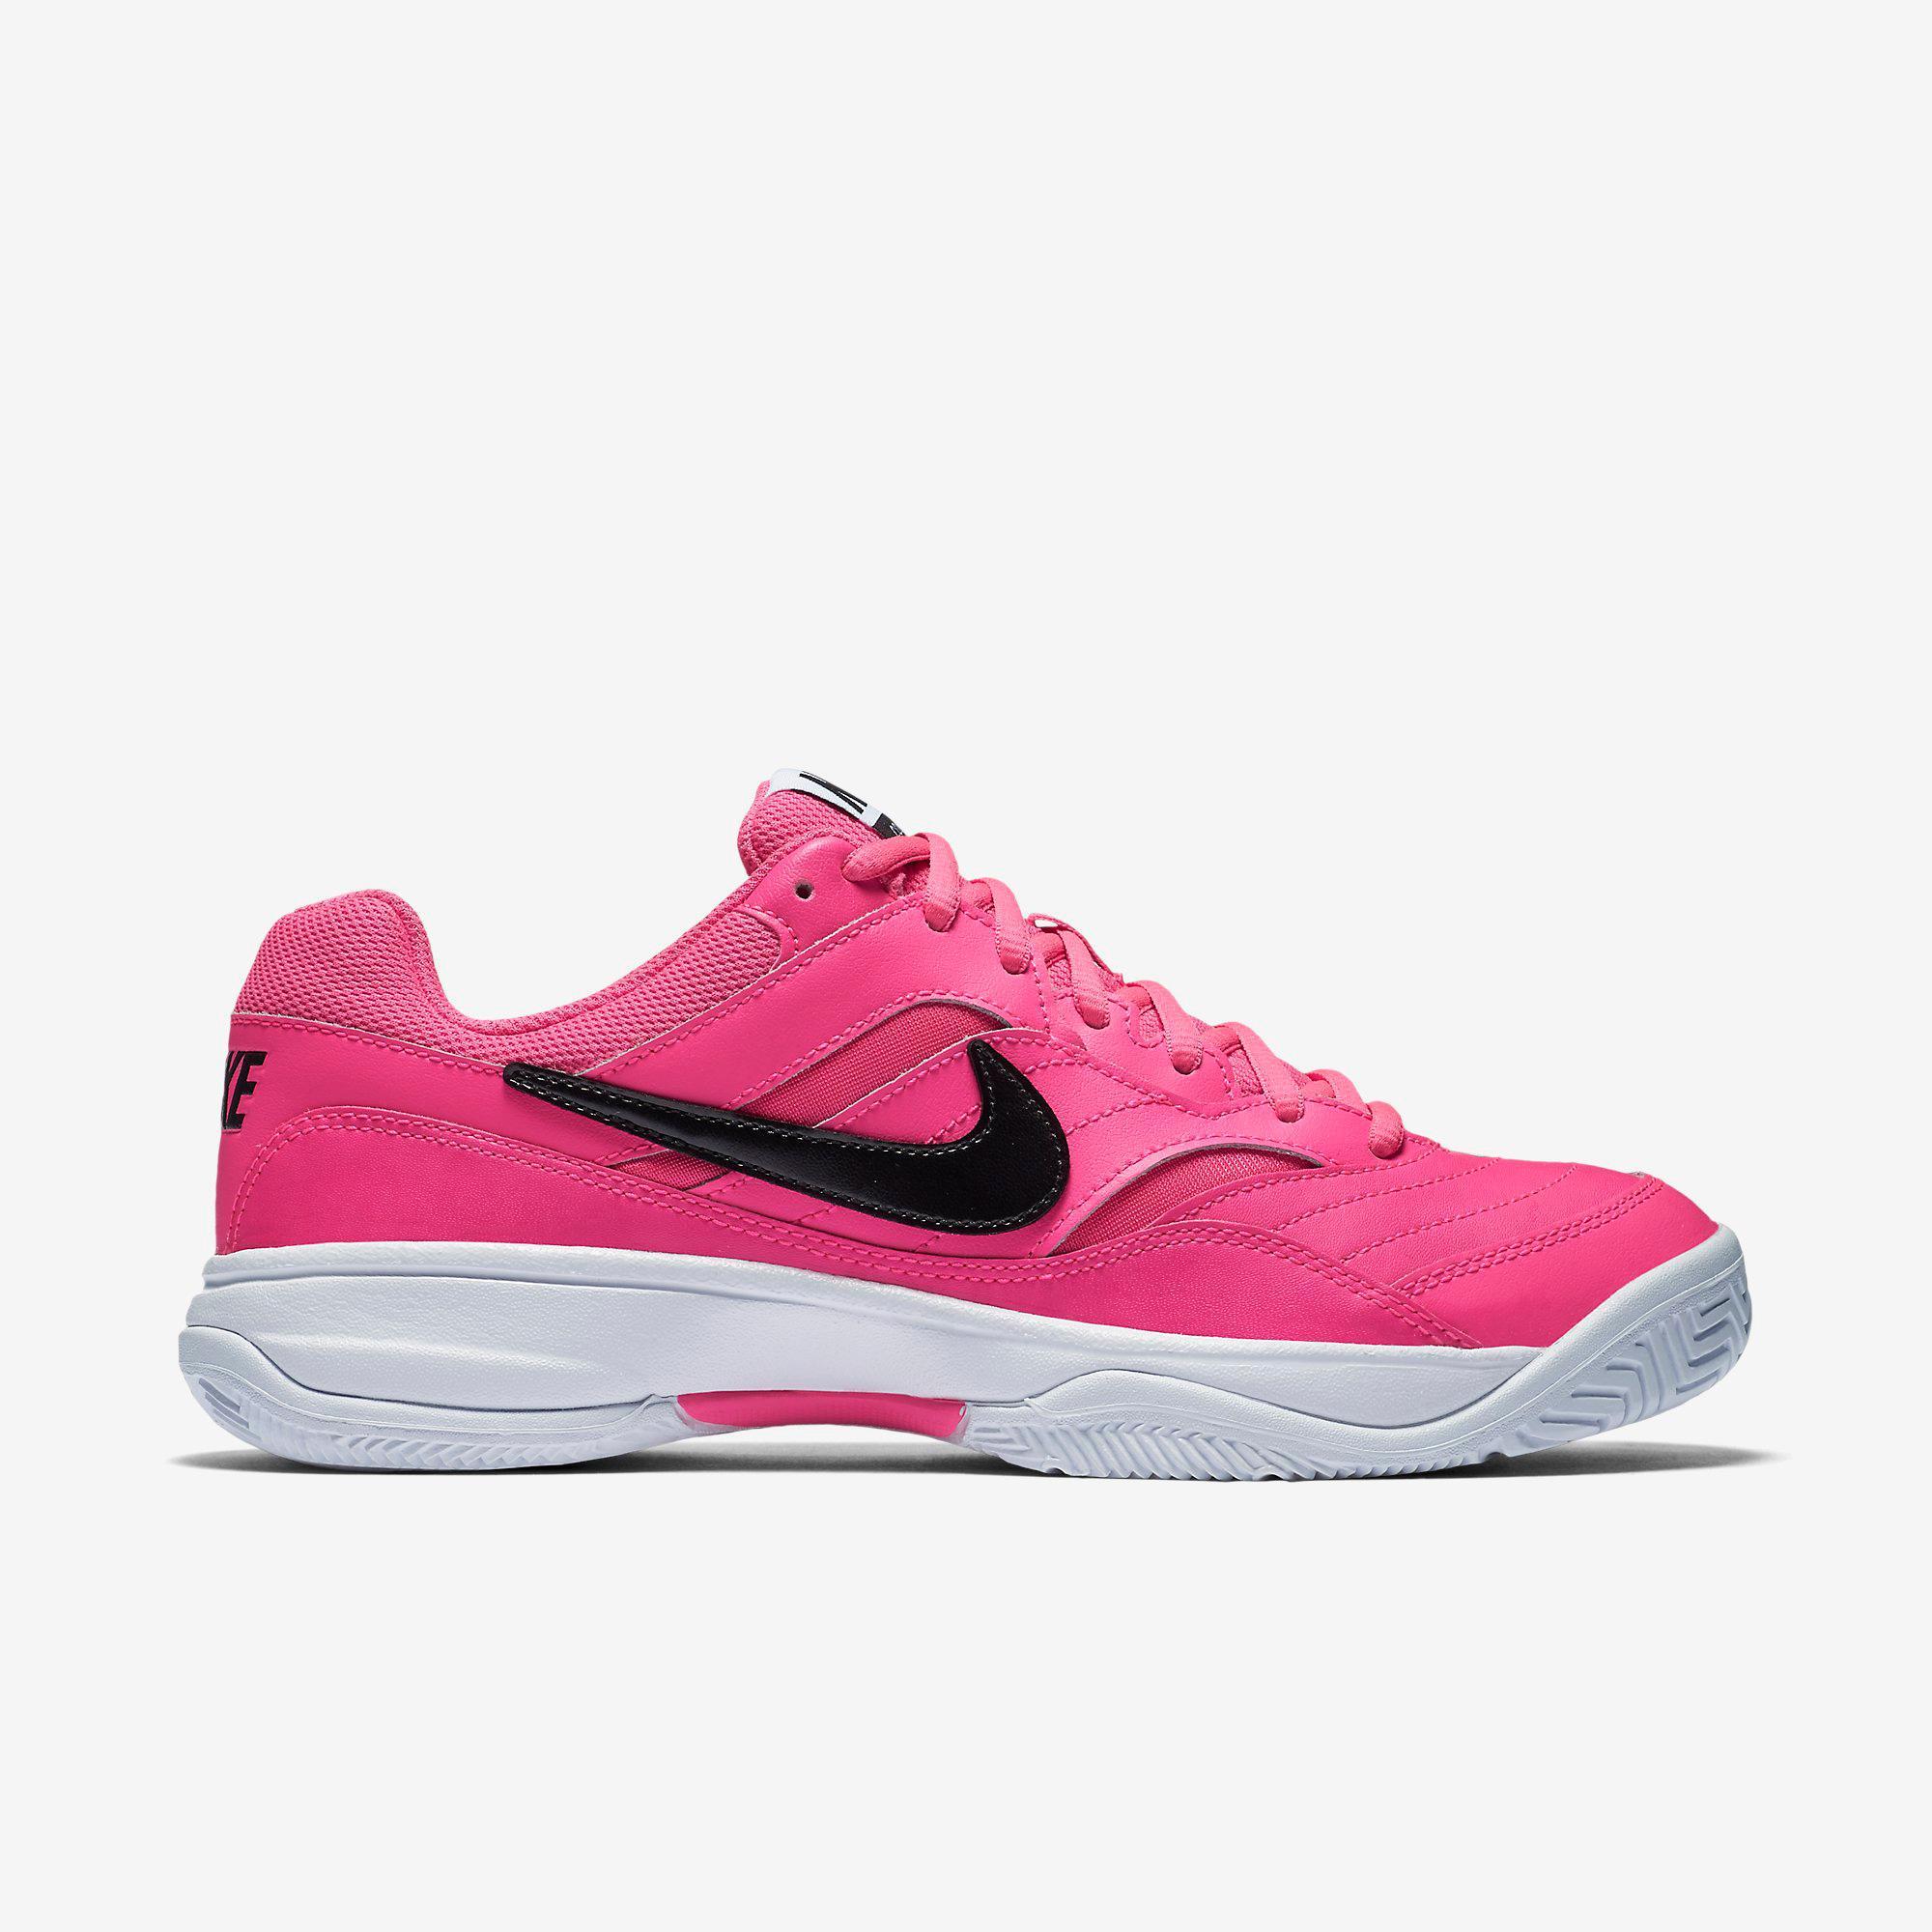 19815176 Nike Womens Court Lite Tennis Shoes - Pink Blast/Black - Tennisnuts.com